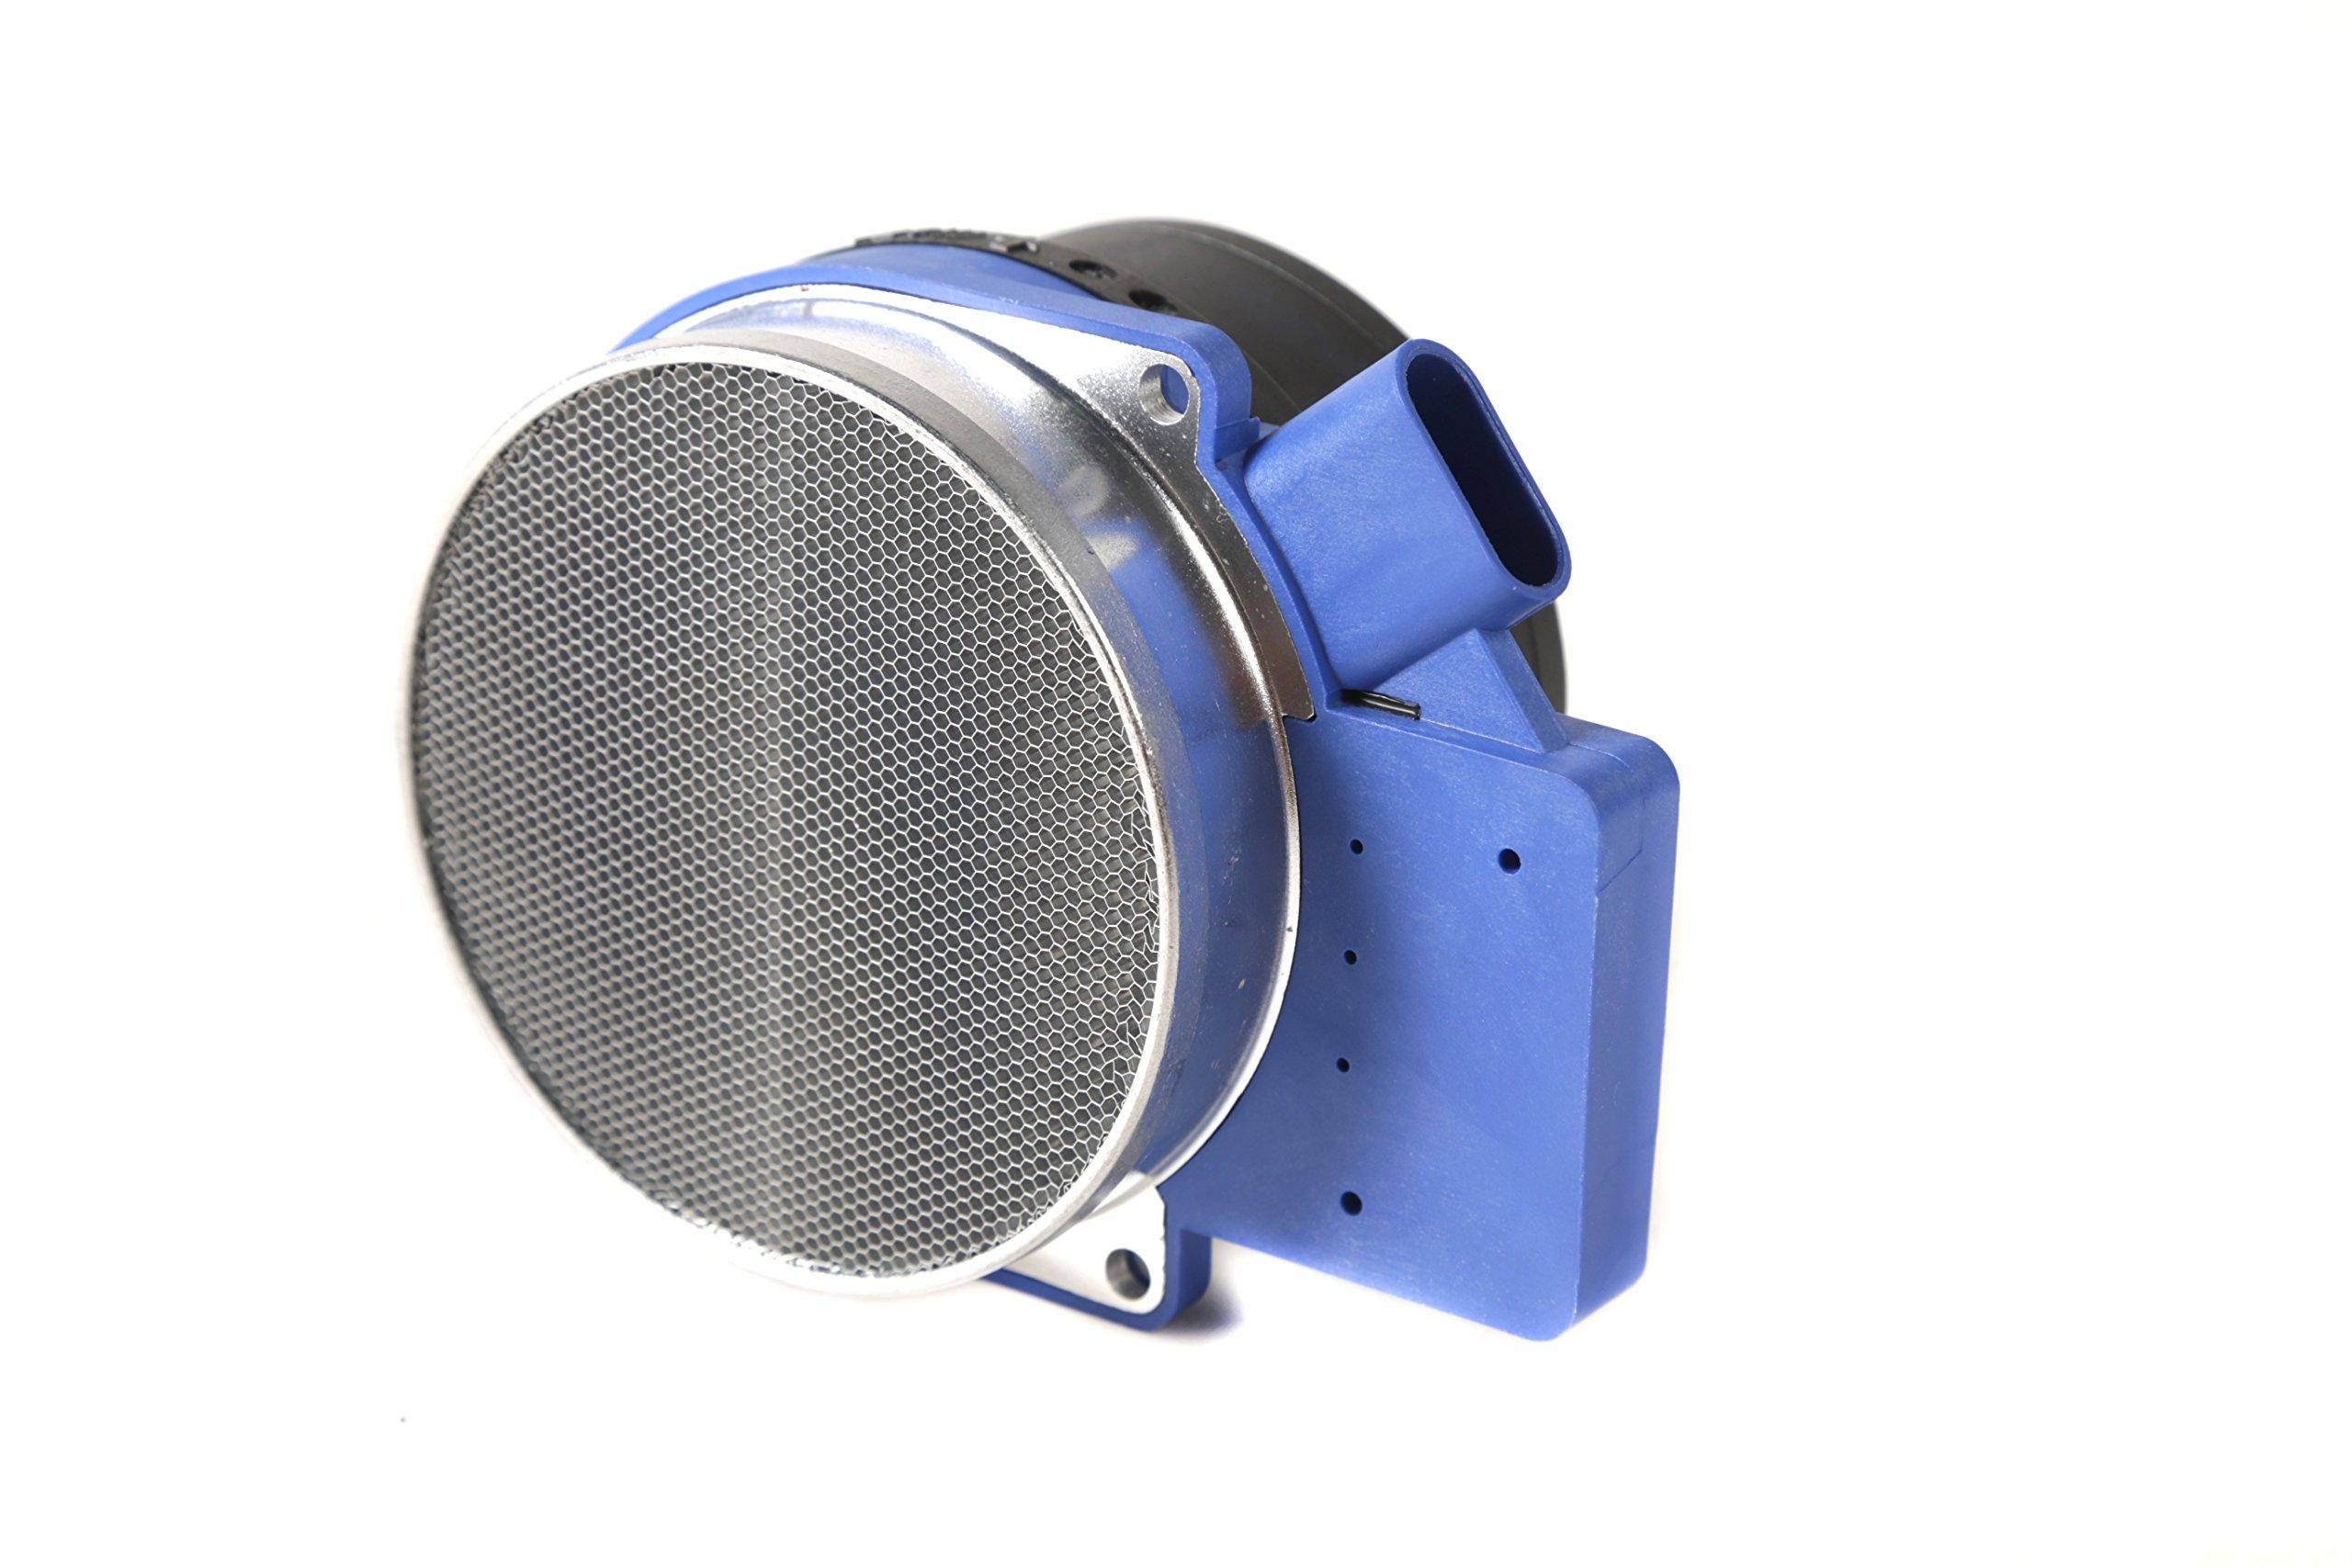 Mr. Sensor Mass Air Flow Meter Sensor for 00-07 Chevrolet Tahoe LT & GMC C5500 & 03-12 Isuzu Ascender 5.3L V8